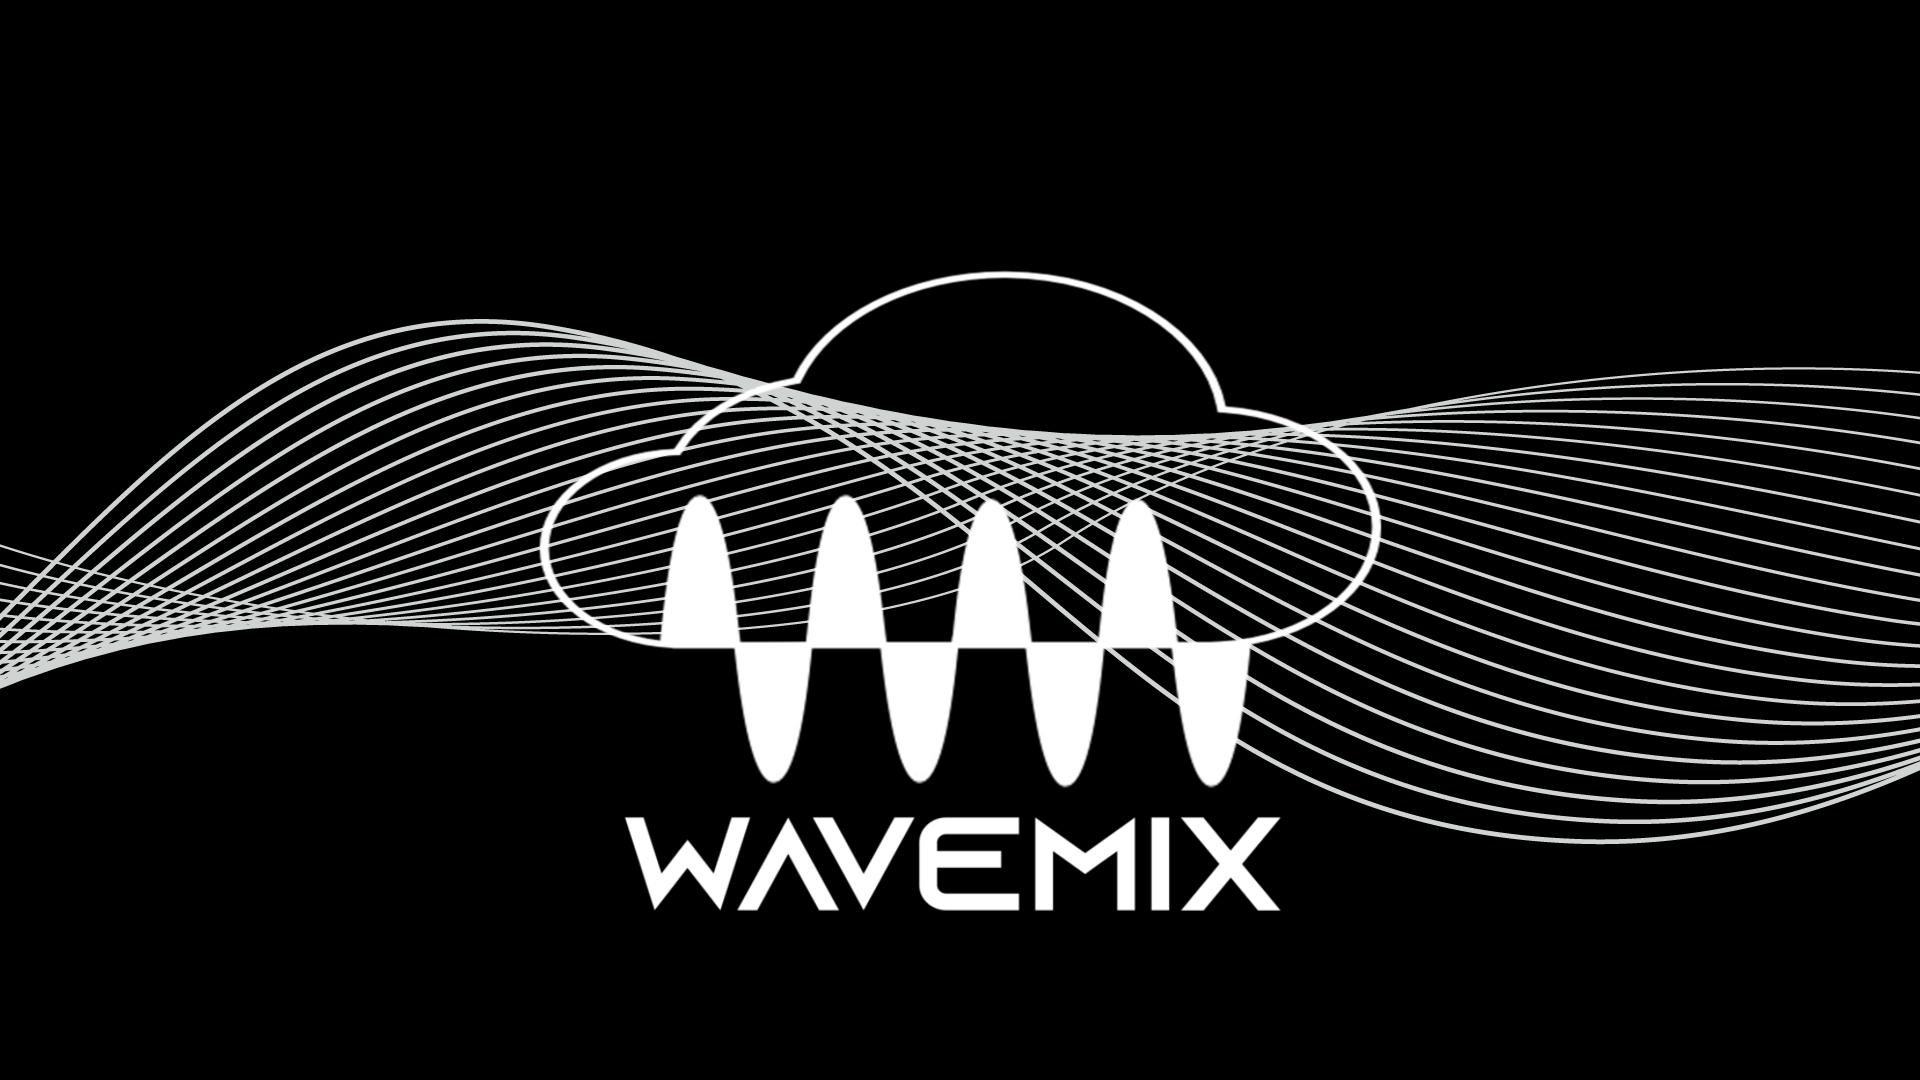 Wavemix